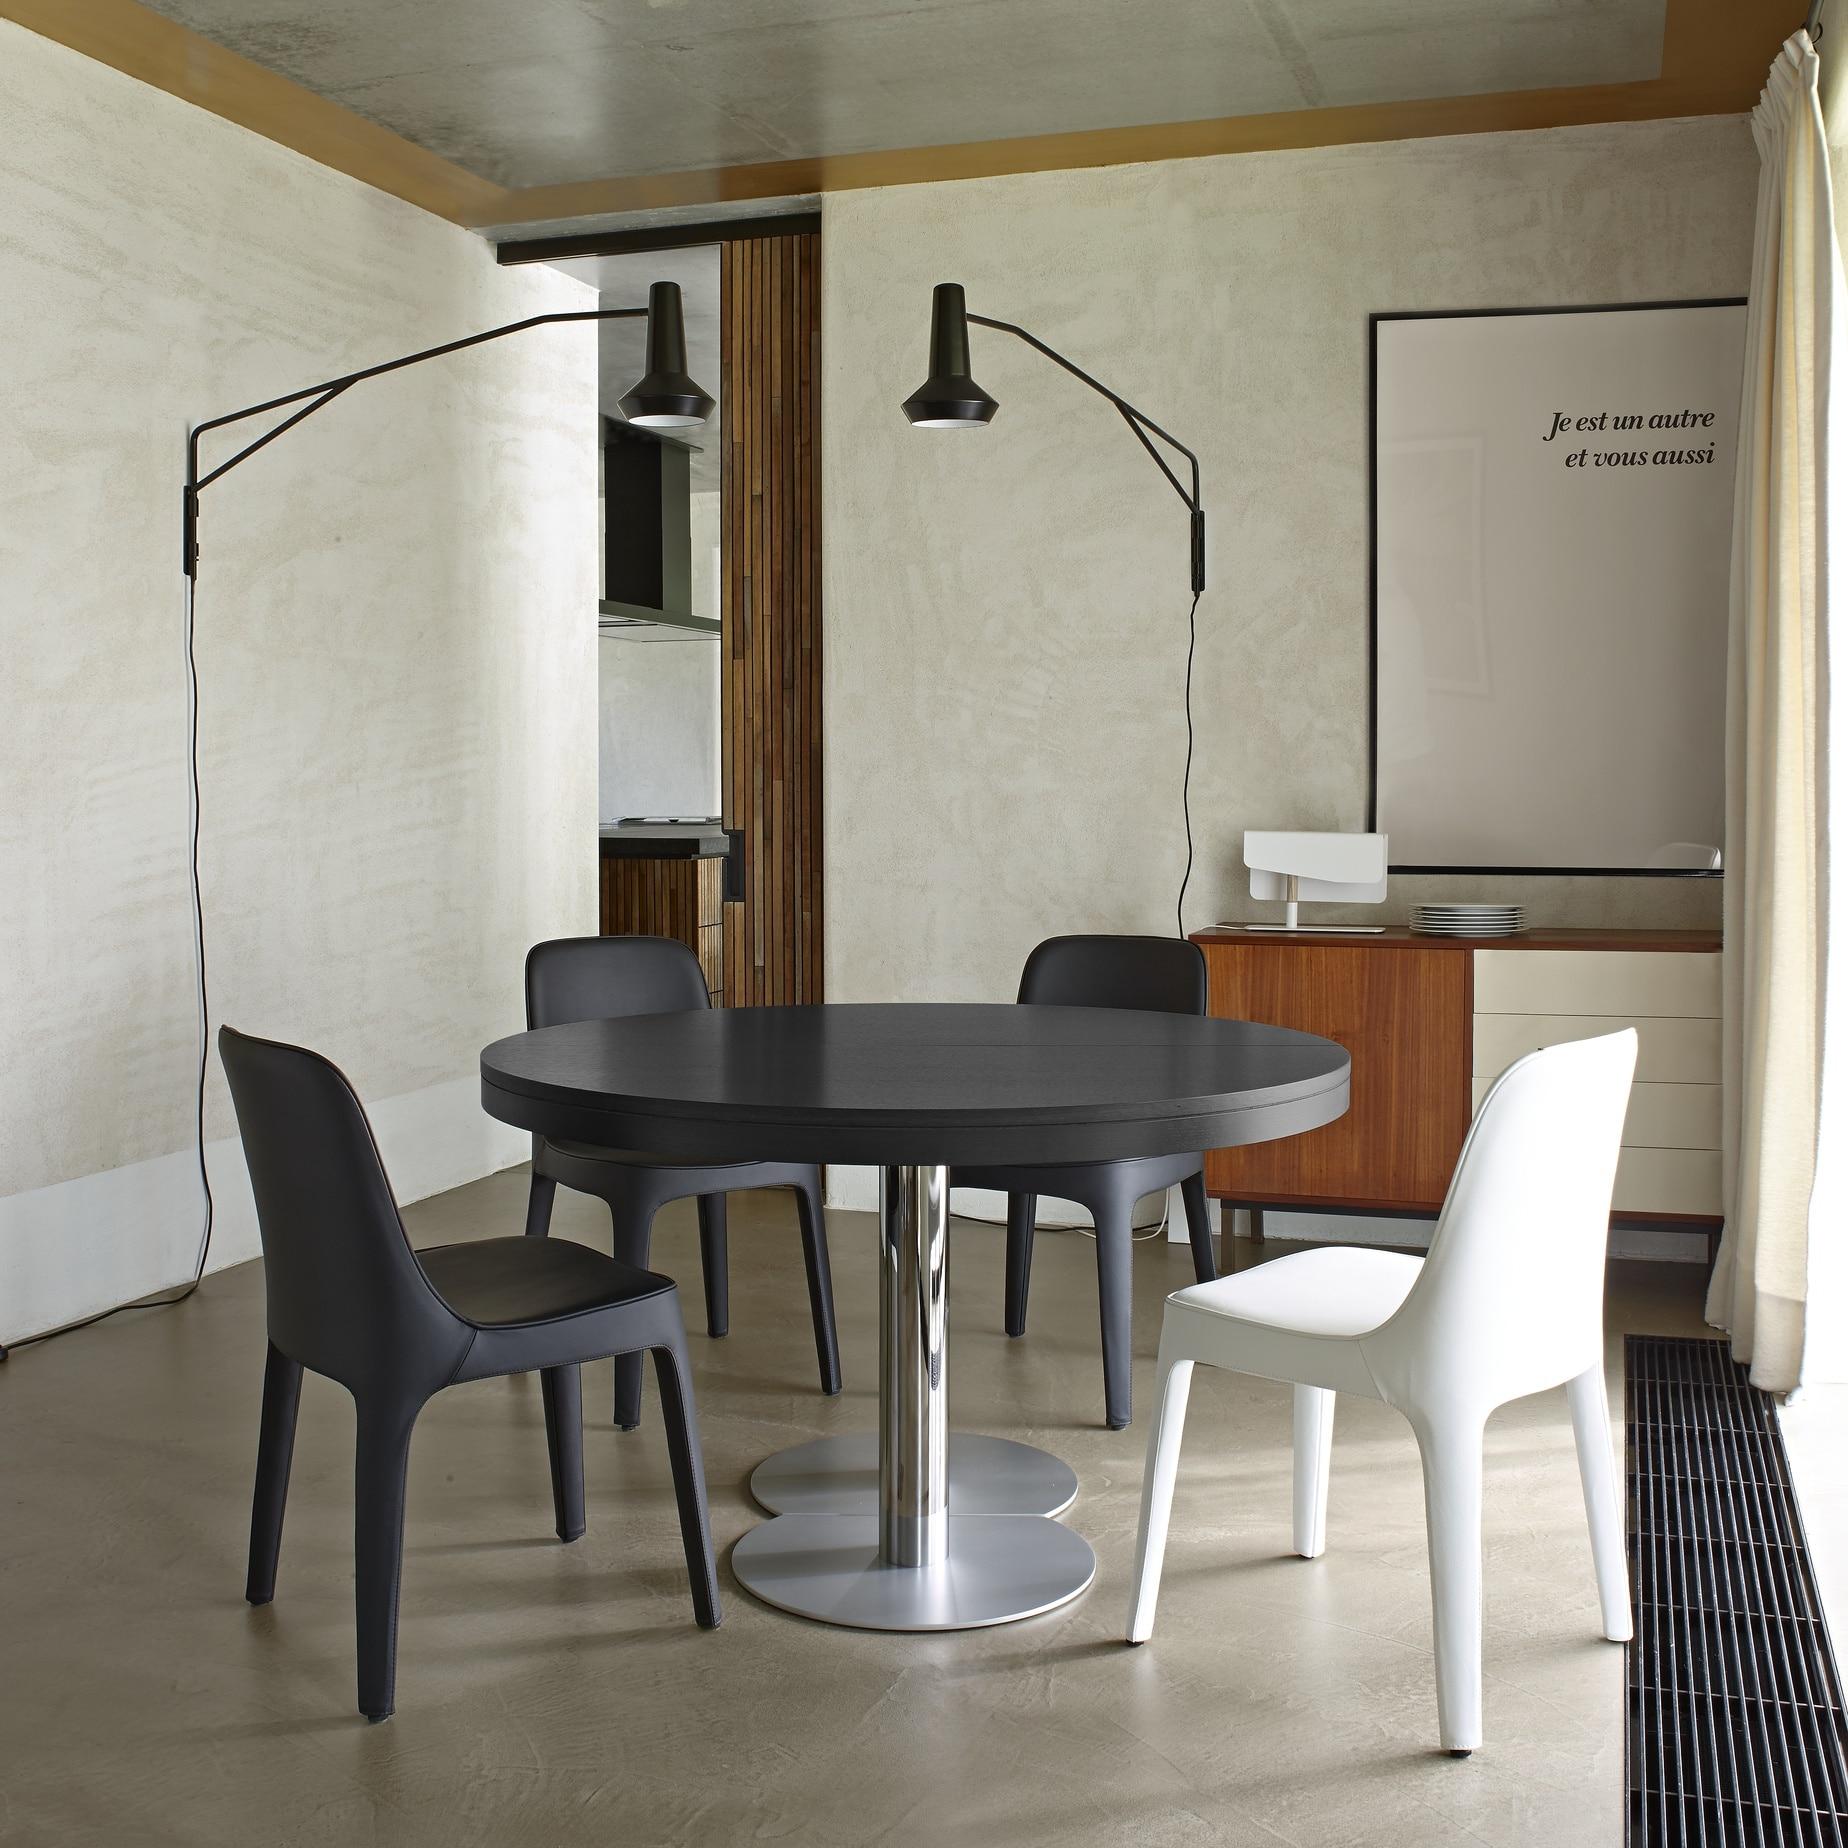 craft cub design. Black Bedroom Furniture Sets. Home Design Ideas